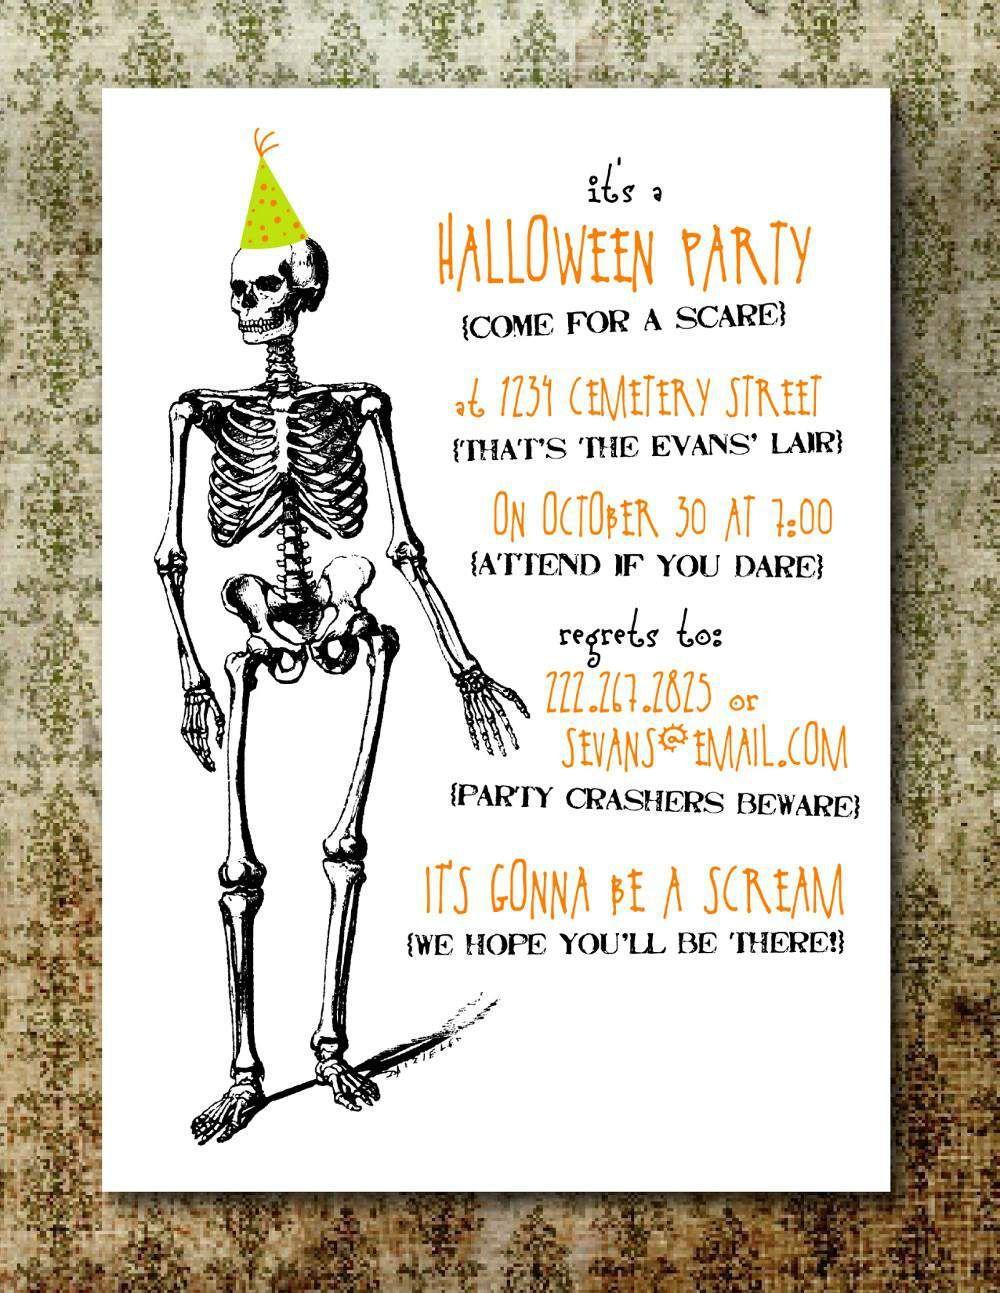 004 Fantastic Free Halloween Invitation Template Concept  Templates Online Printable Birthday Party WeddingFull